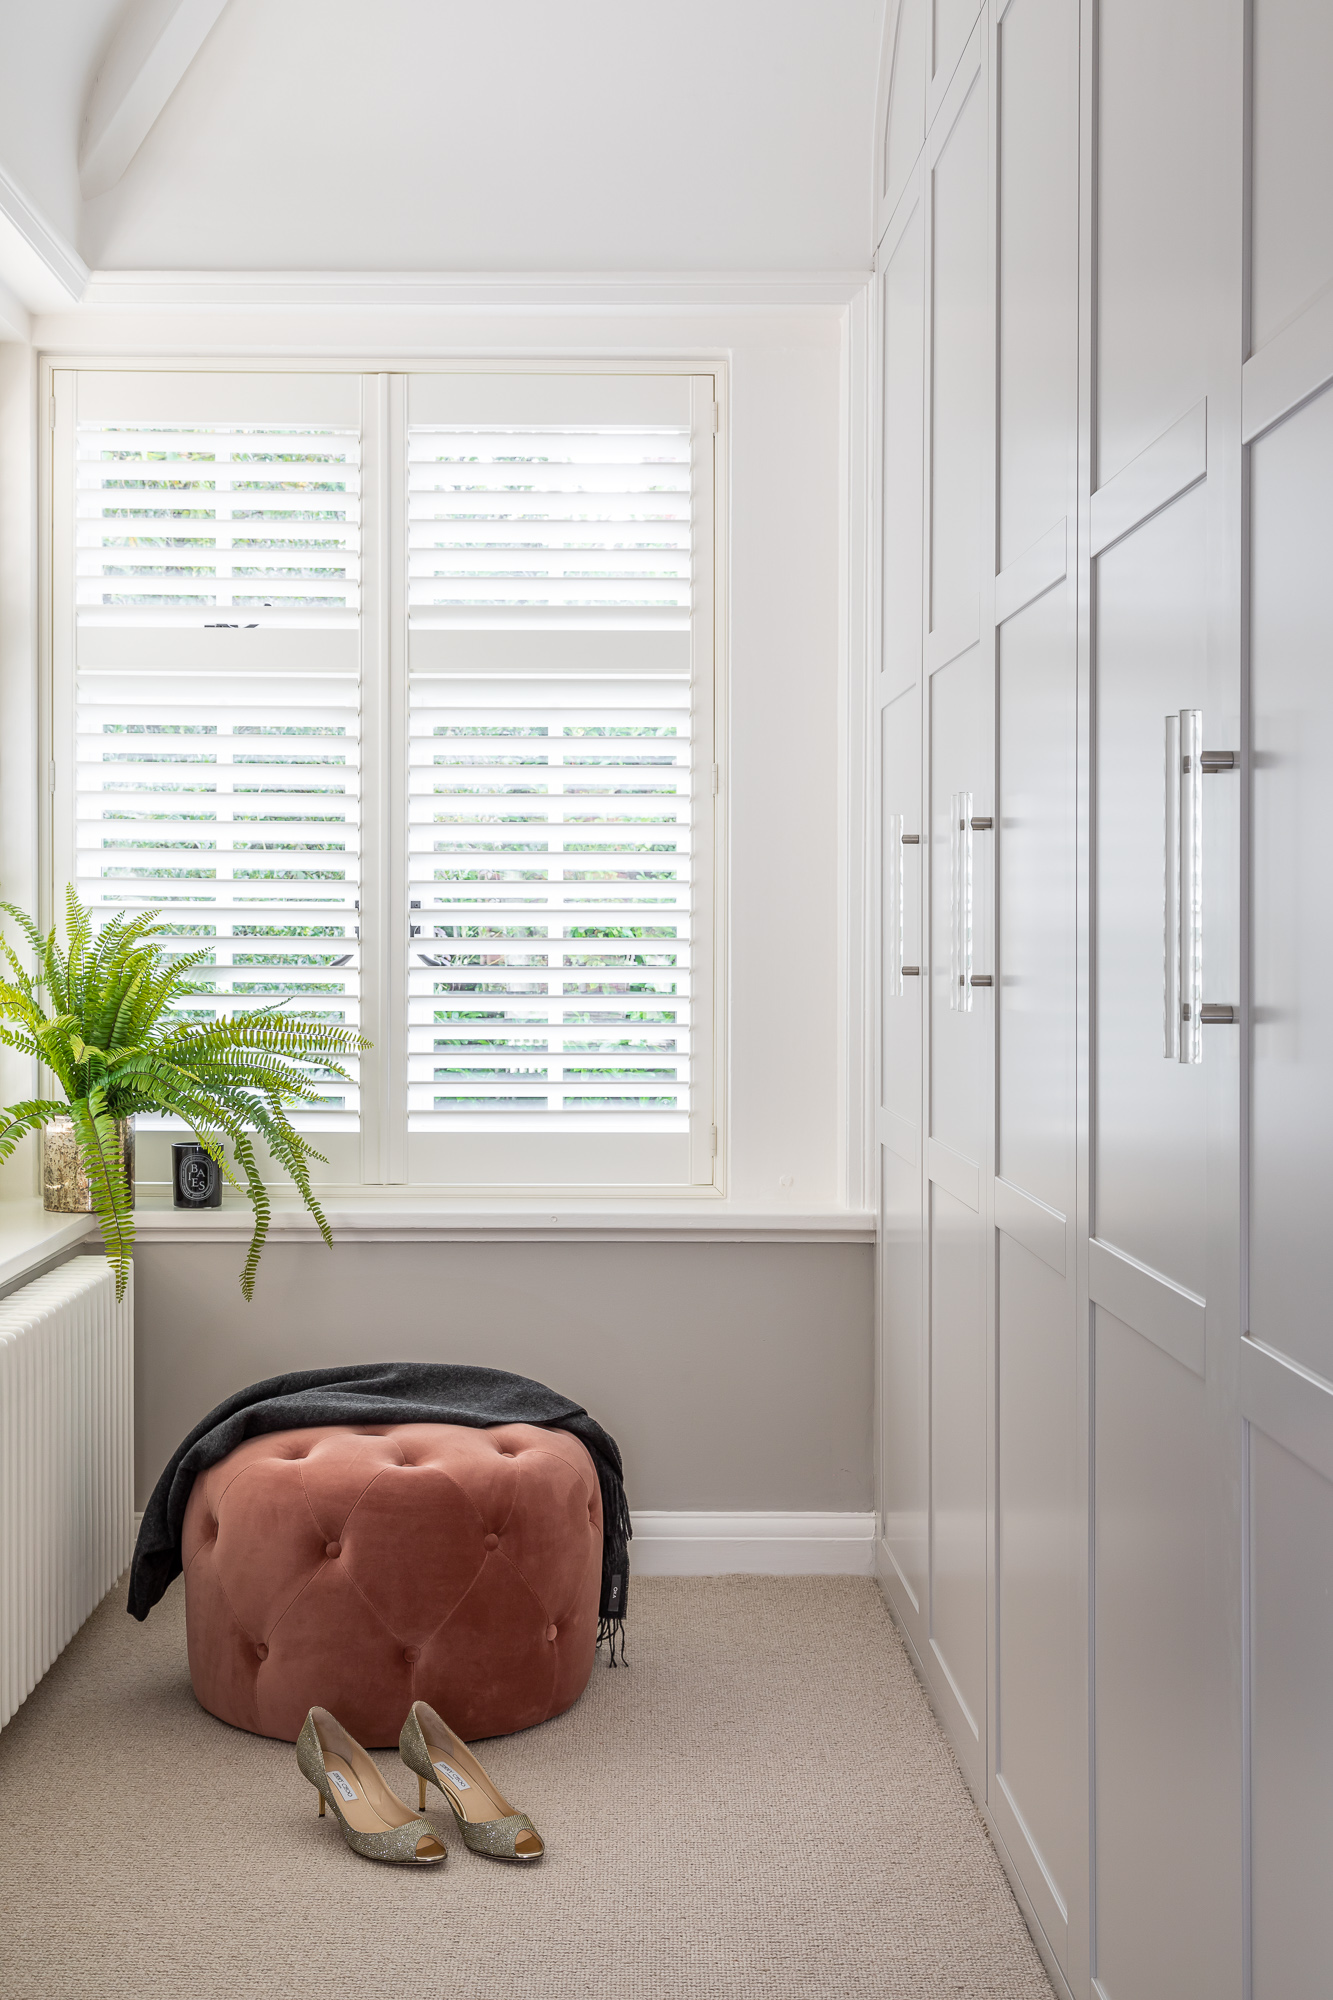 jonathan bond, interior photographer, pouffe by window, great missenden, buckinghamshire